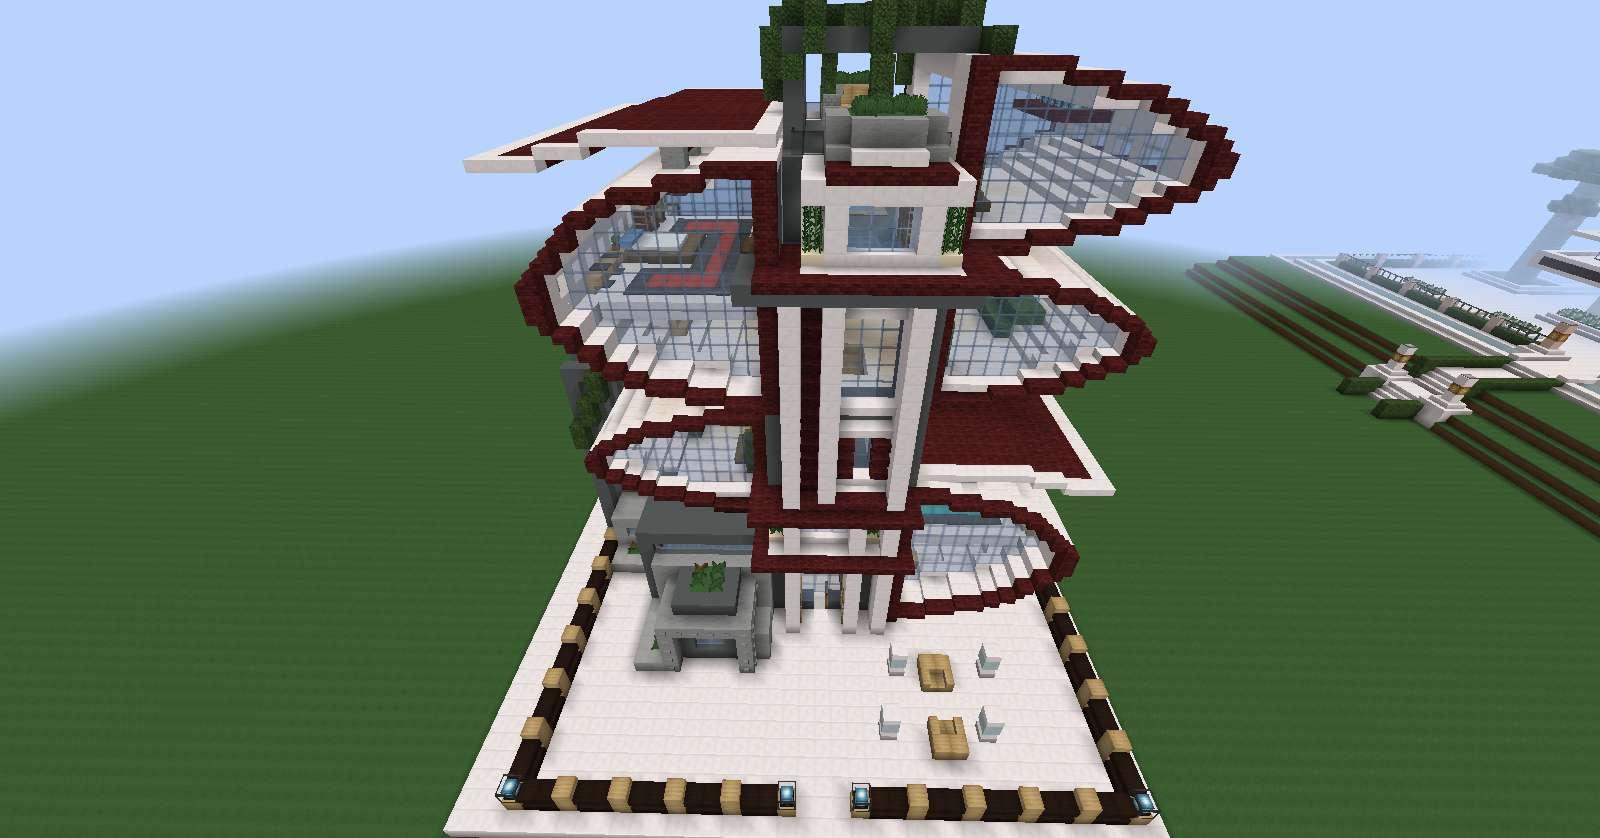 Nueva casa torre futurista minecraft for Casas minecraft planos